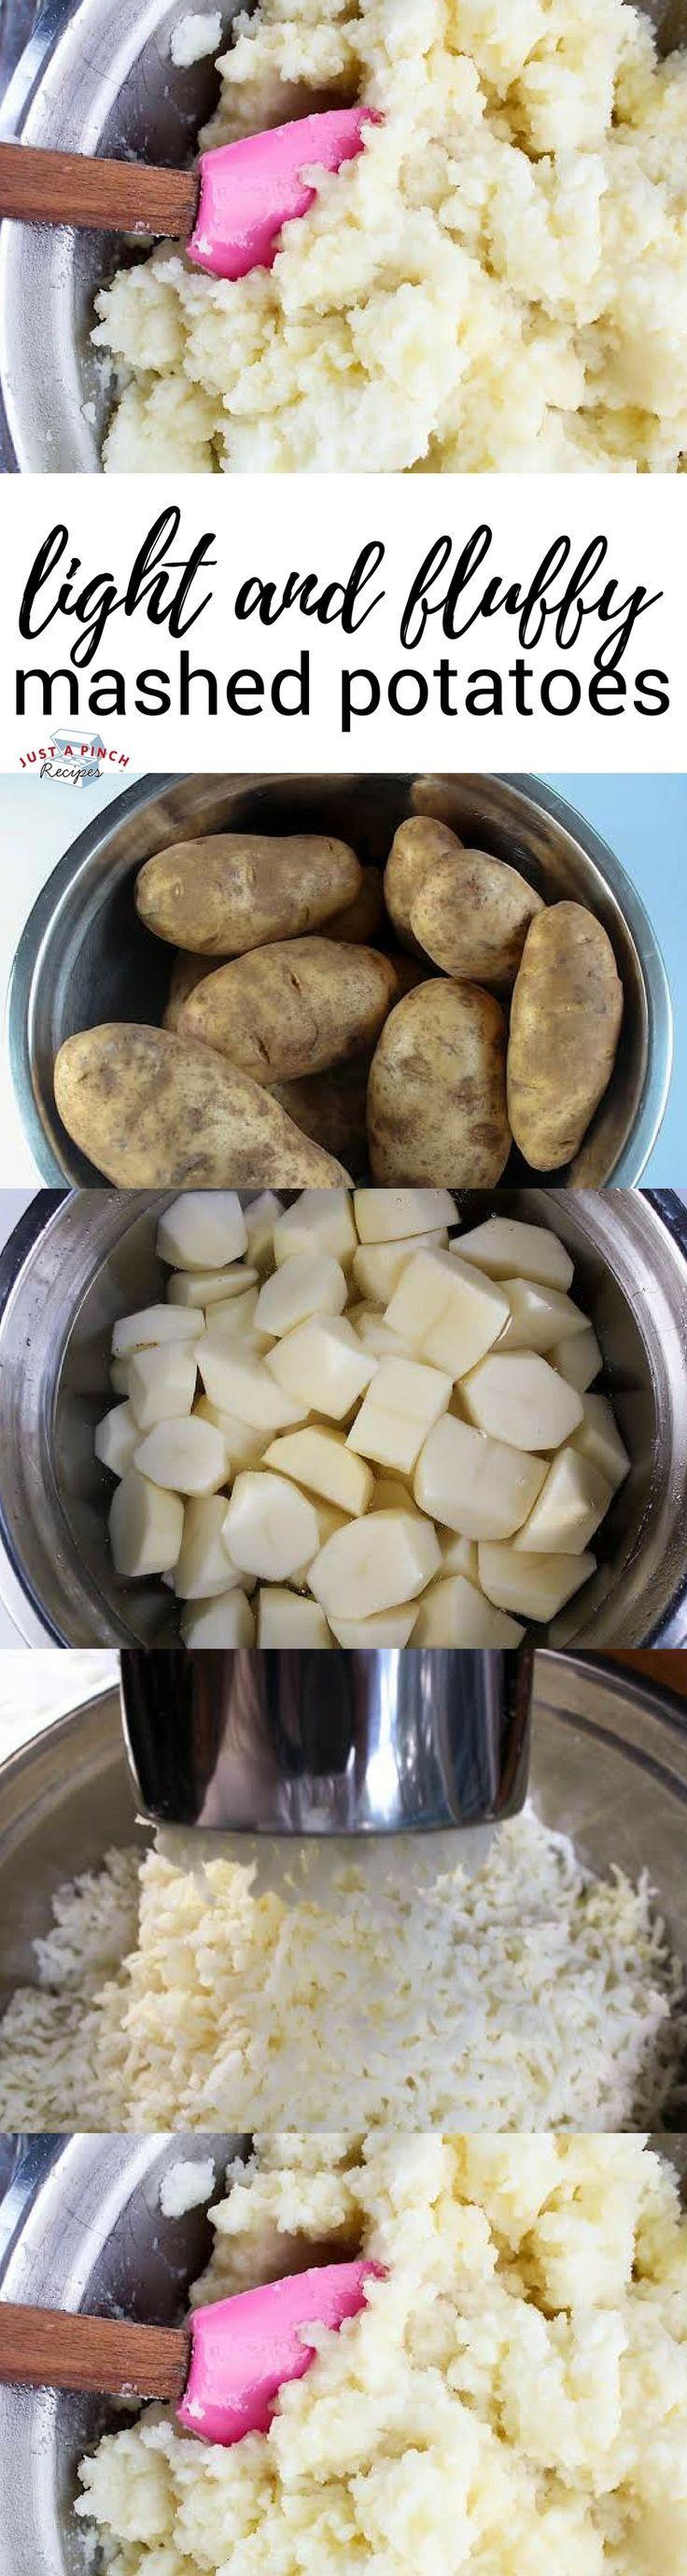 Easy light and fluffy mashed potatoes recipe! #ThanksgivingRecipes #thanksgivingsides #mashedpotatorecipes #mashedpotatoes #potatorecipes #christmasrecipes #christmasdinner